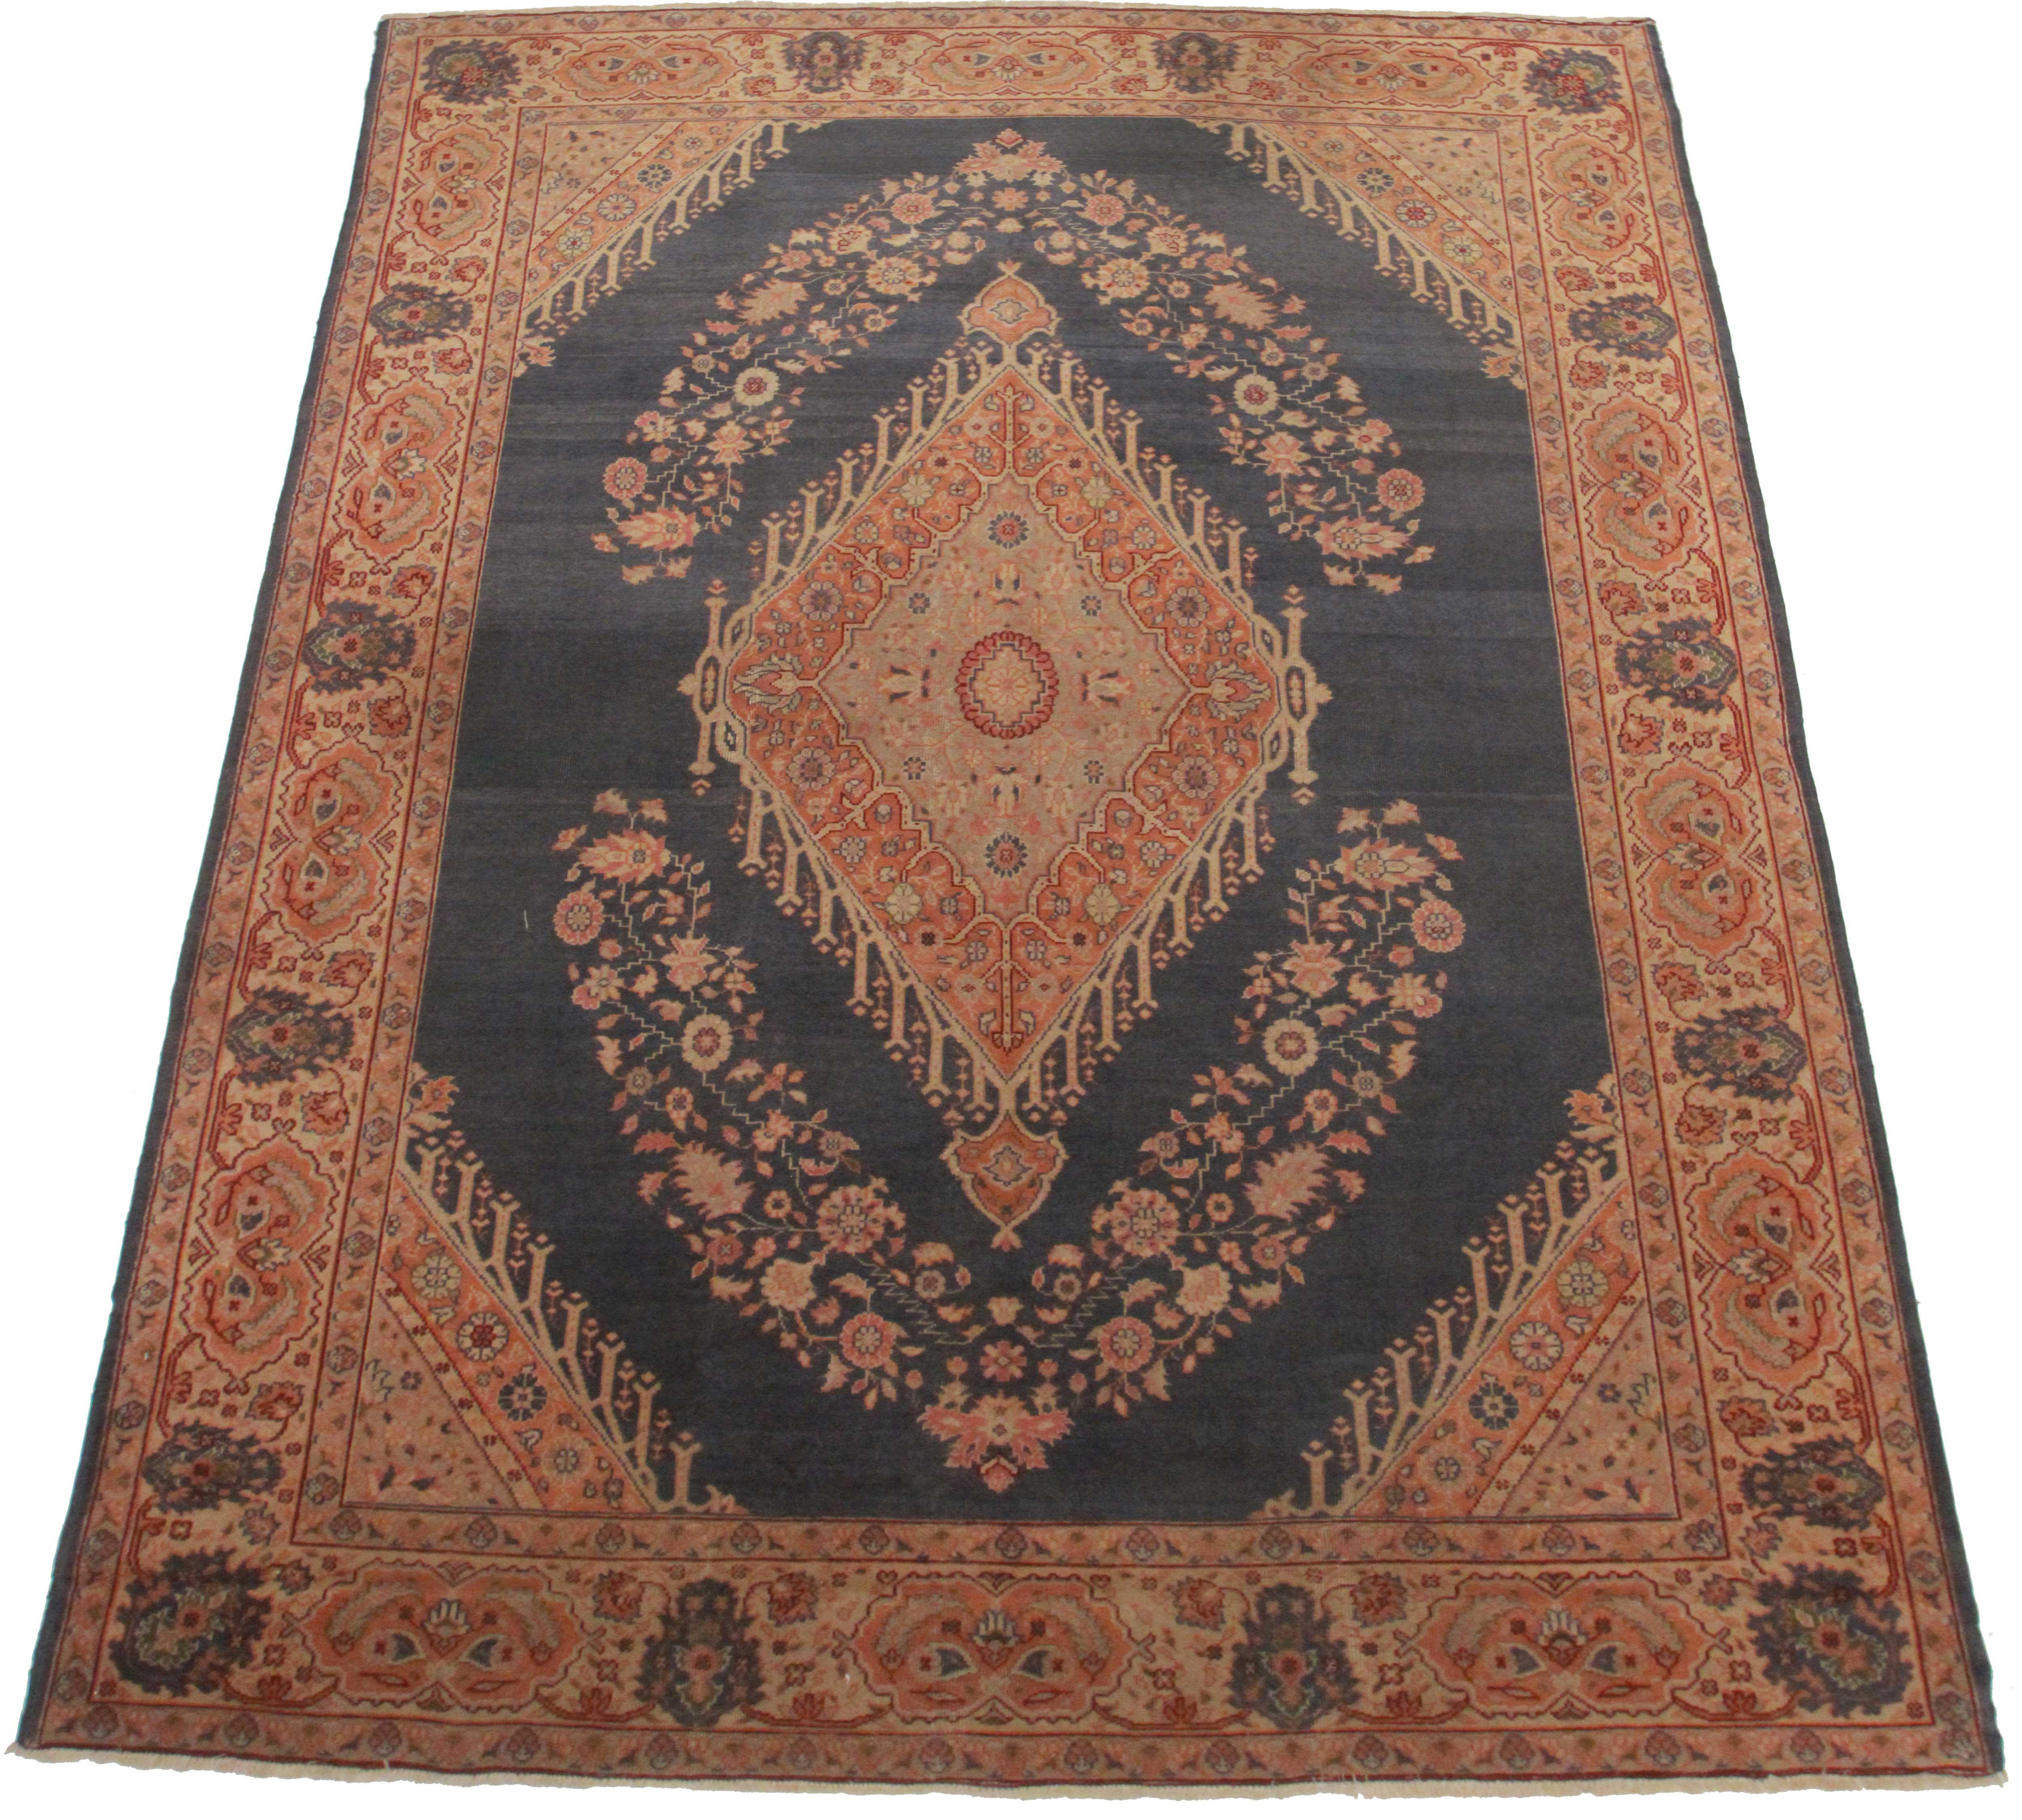 Rugsindallas Antique Turkish Oushak Wool Rug 8 X 11 5 Chairish